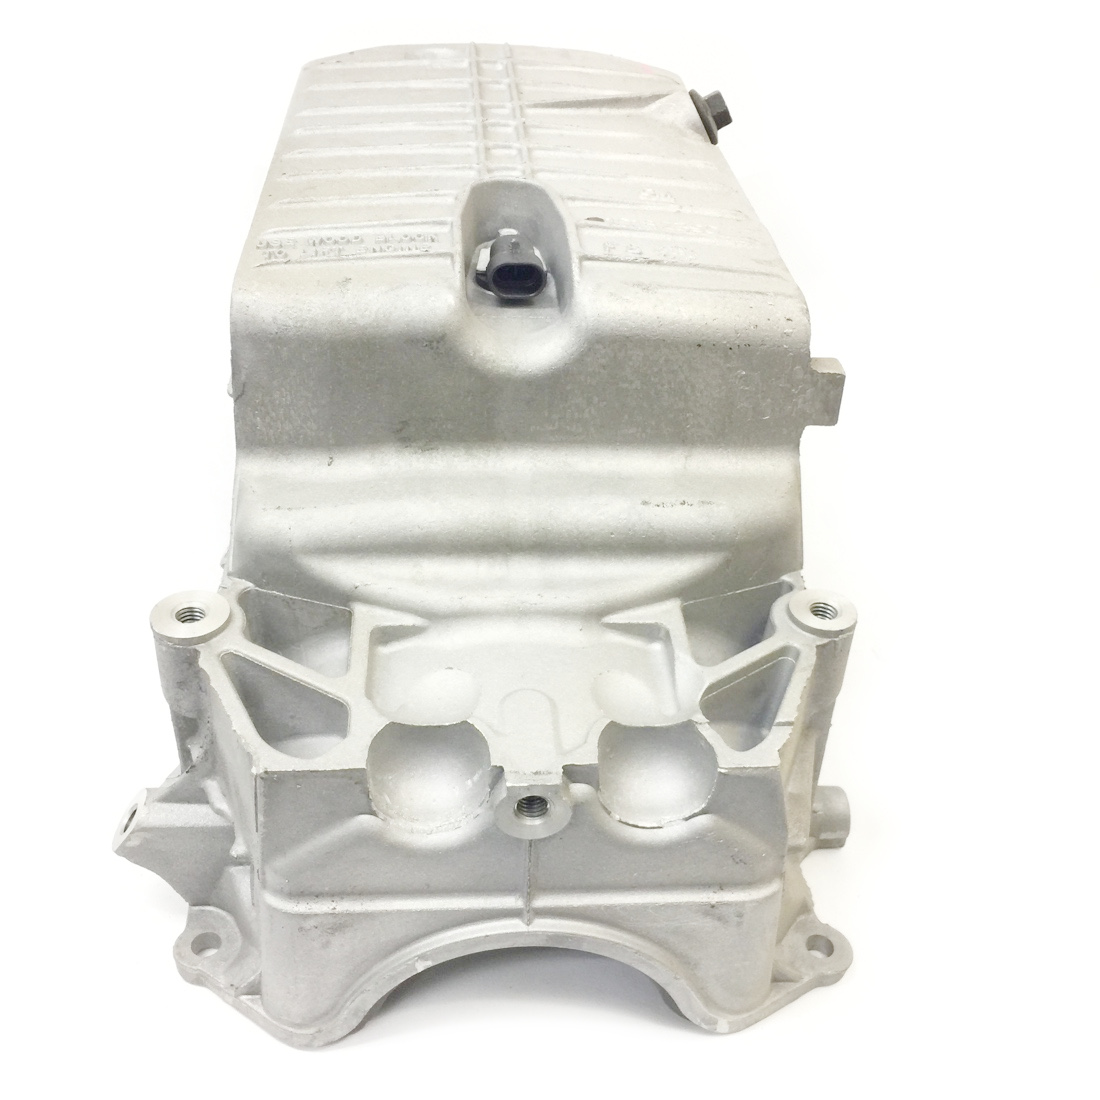 Factory New GM OEM Oil Pan1994-2003 6-cyl 3 1L & 3 4L 3100, 3400 #12577511